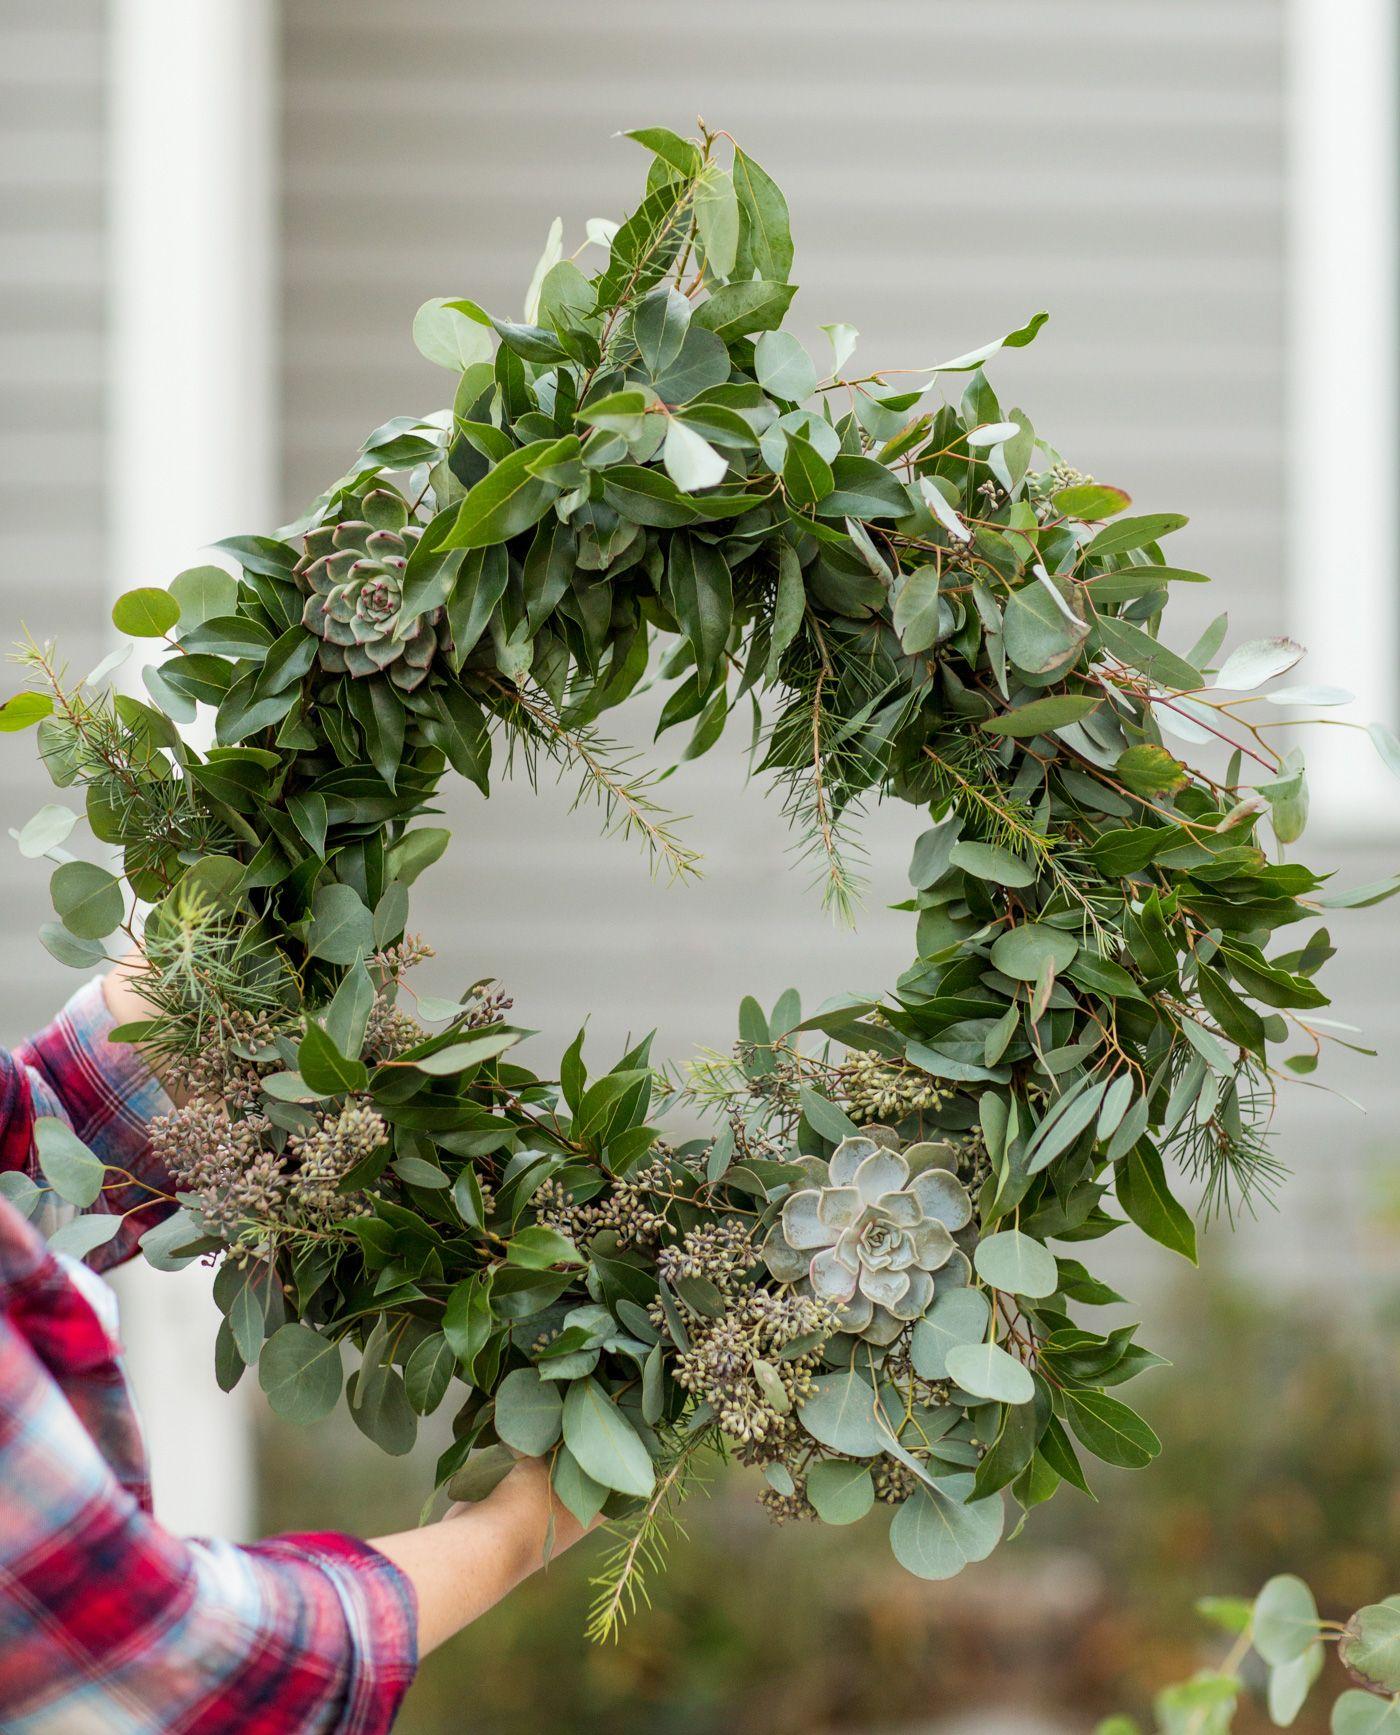 DIY Eucalyptus + Pine Christmas Wreath Homemade